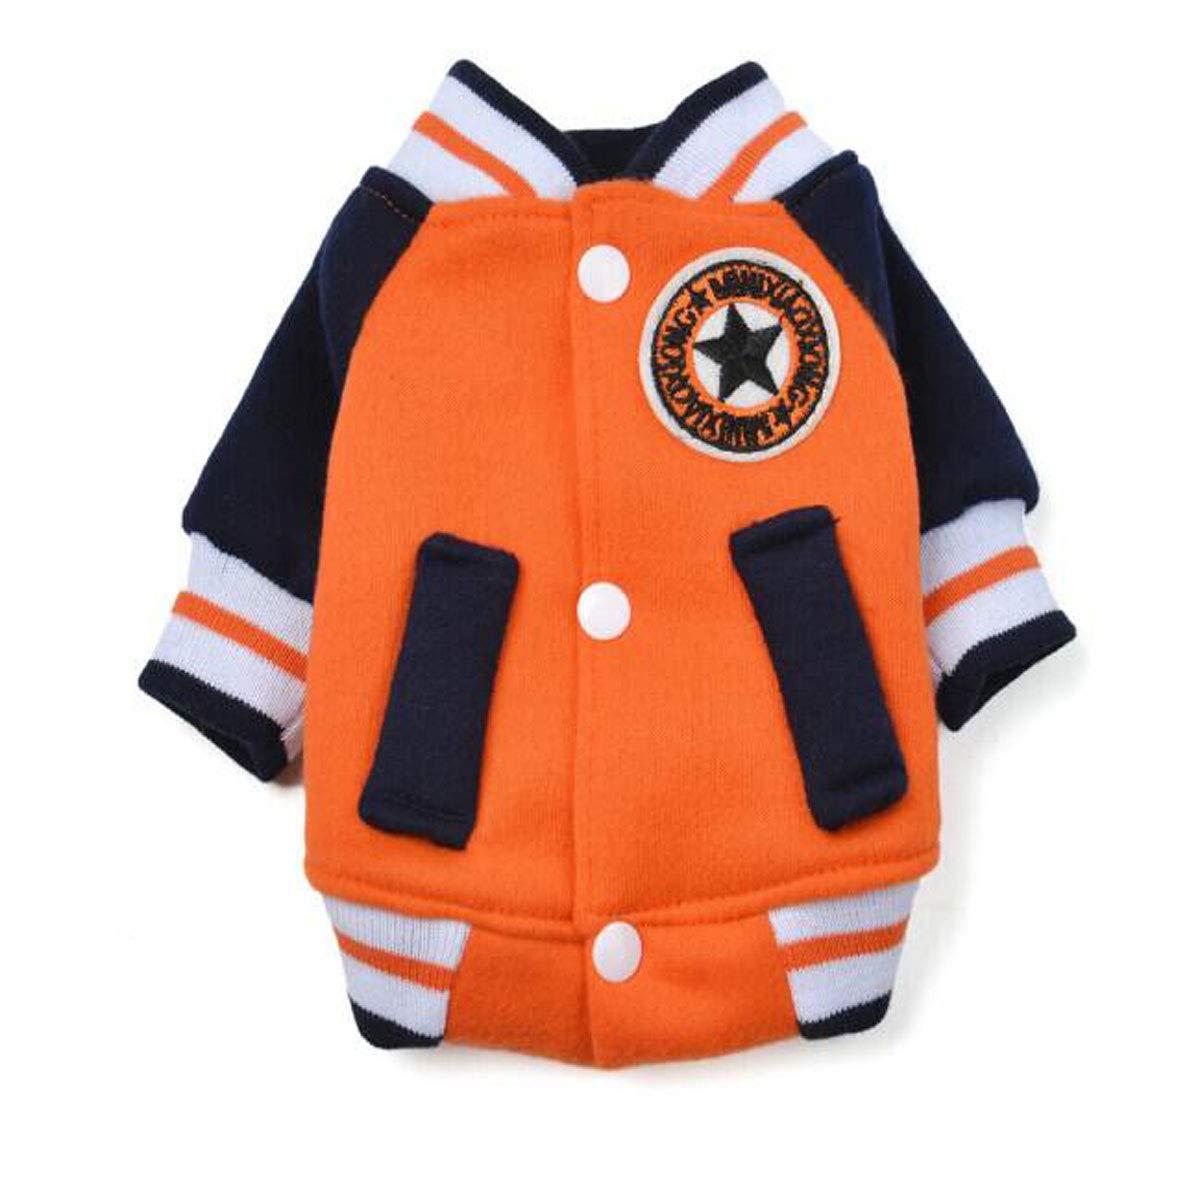 orange L orange L Pet Autumn and Winter, Small Dog Clothing (color   orange, Size   L)